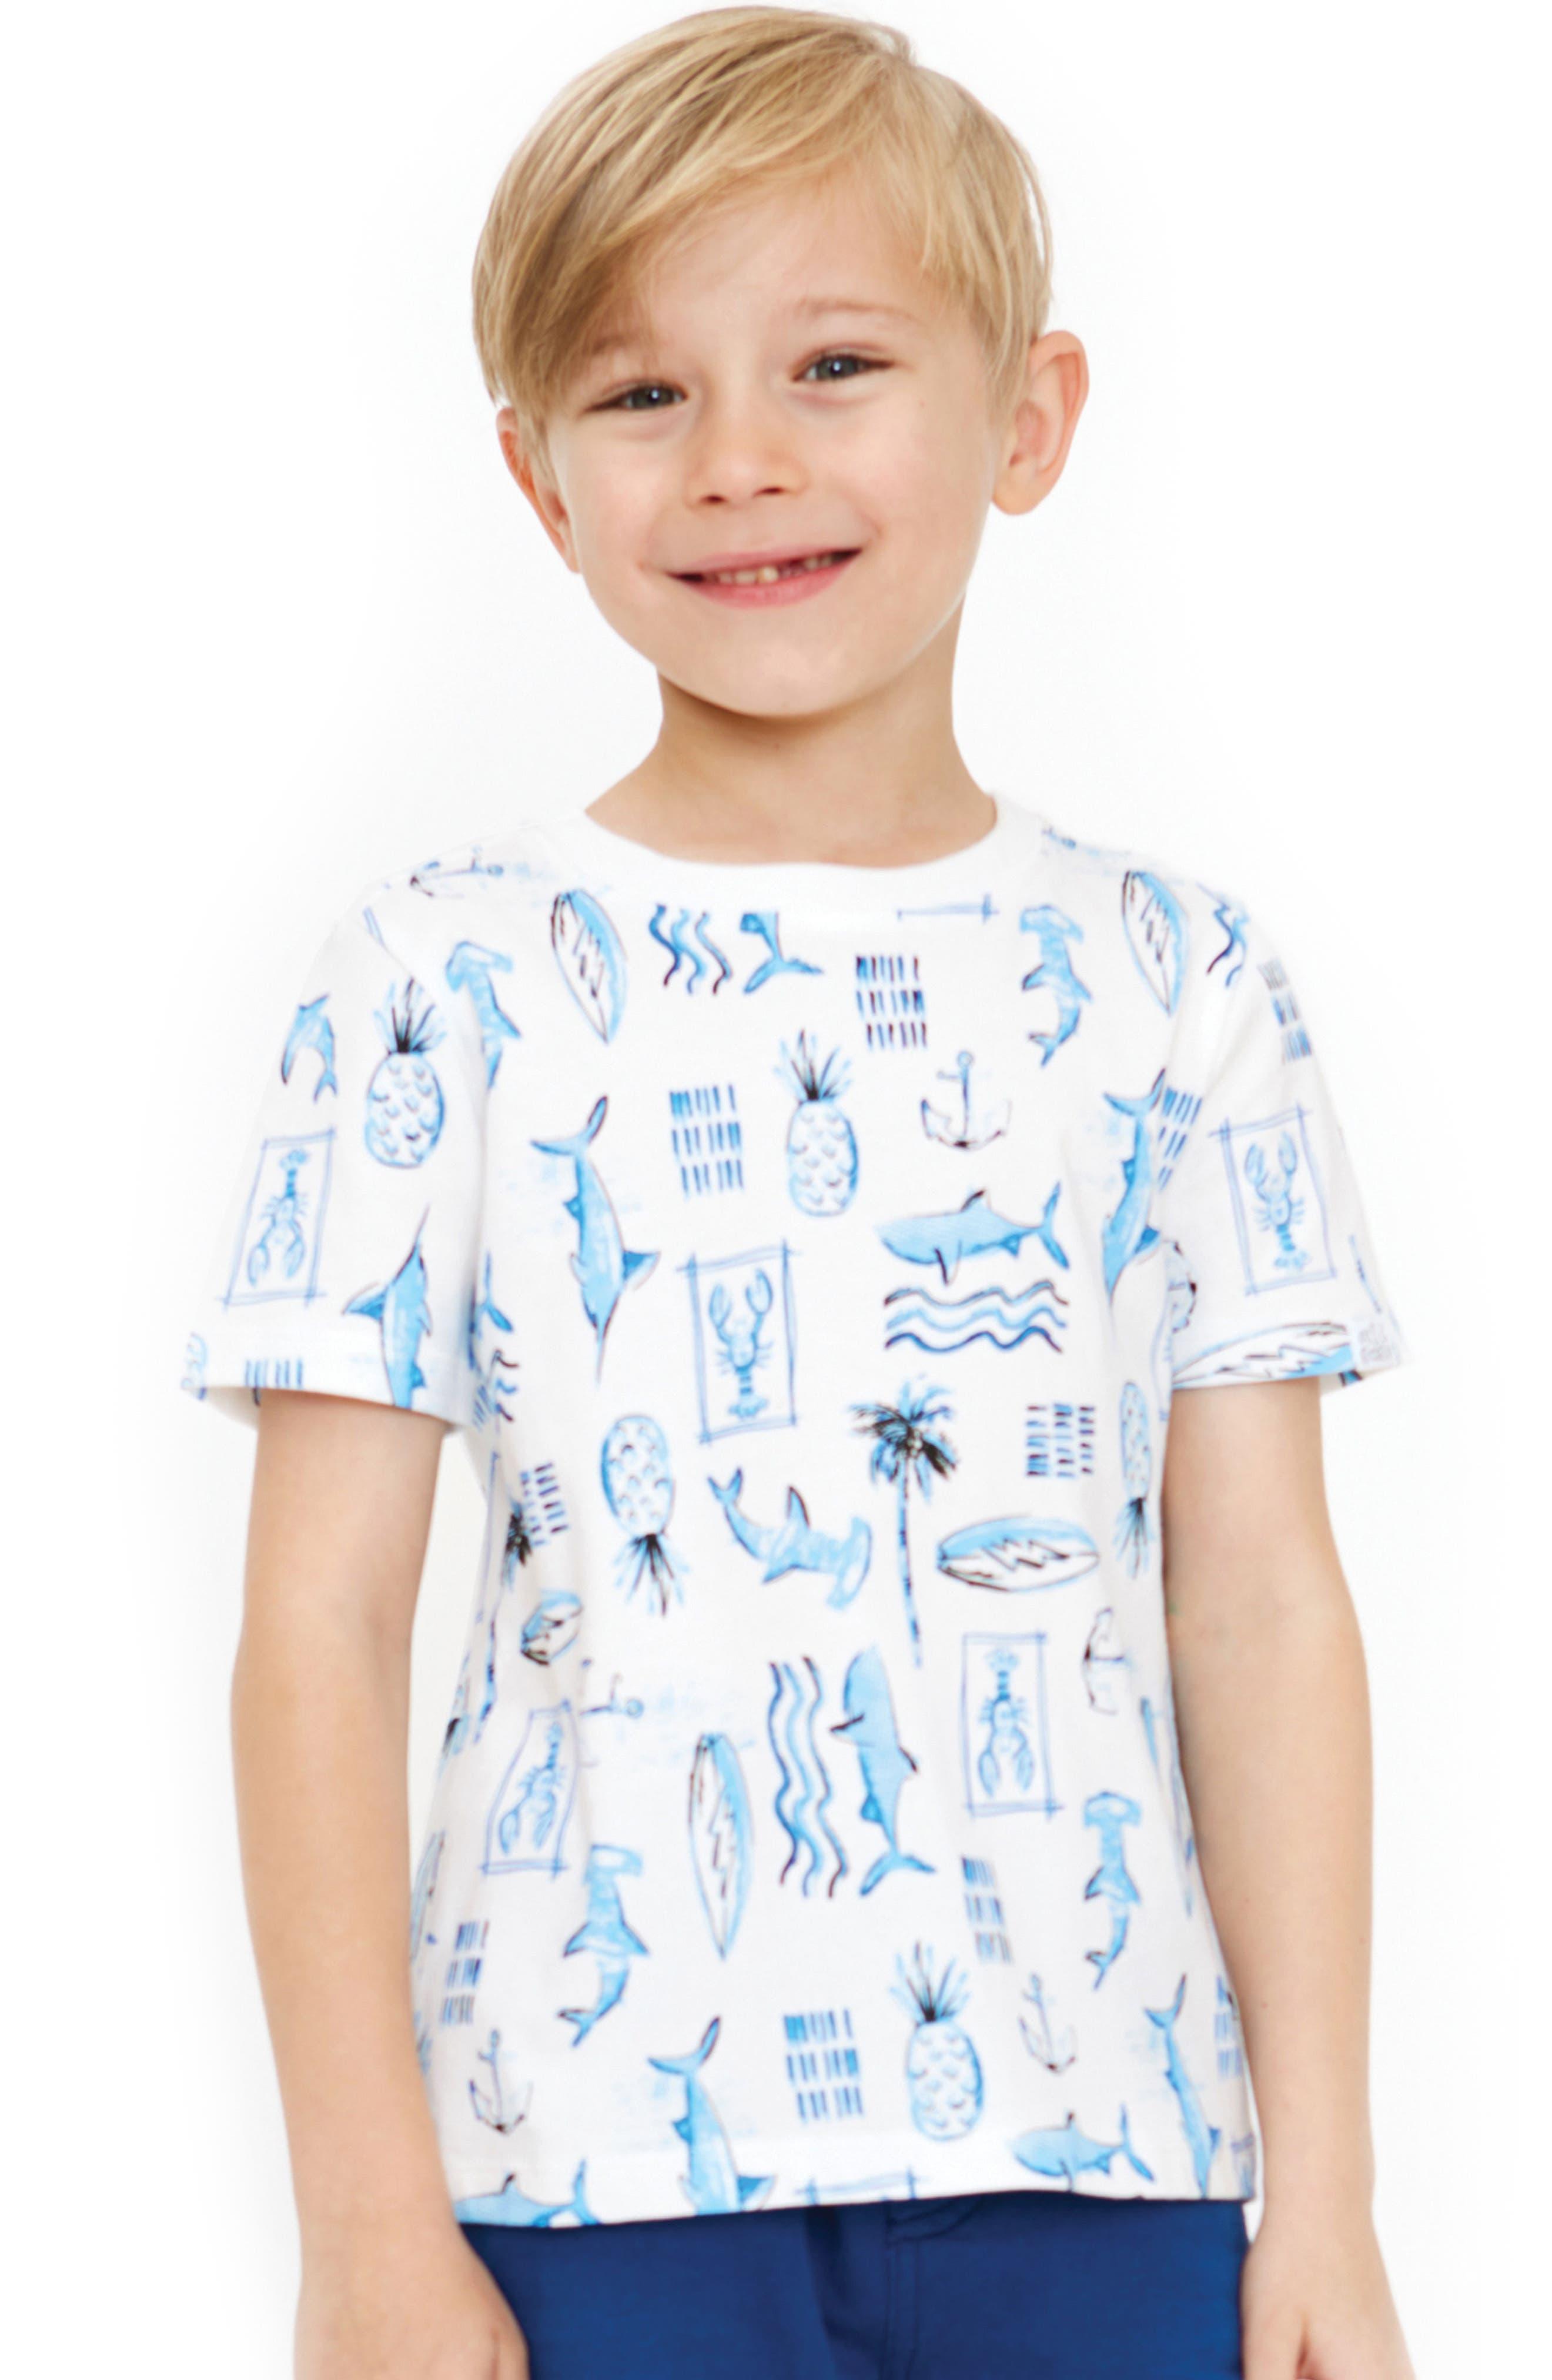 William Nautical Organic Cotton T-Shirt,                         Main,                         color,